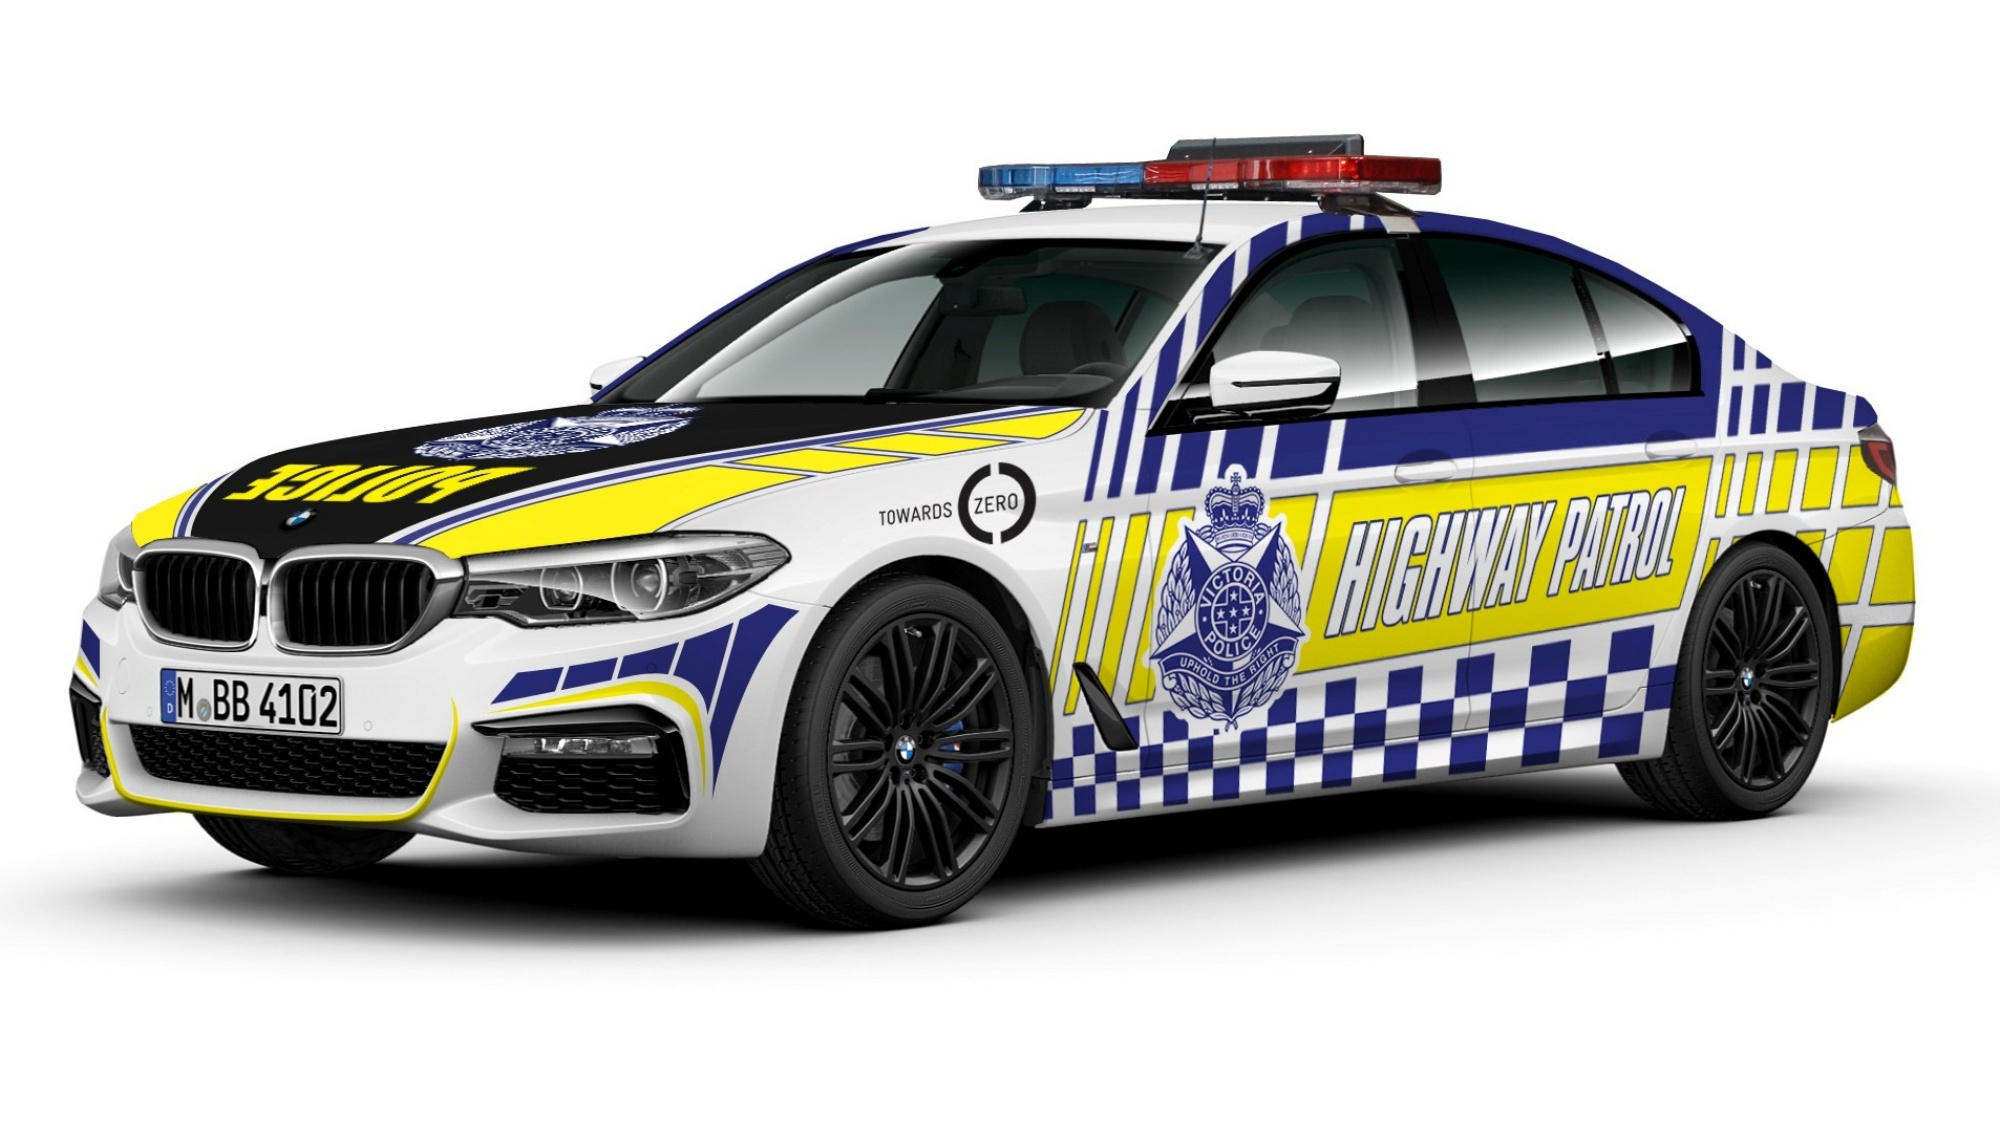 News - BMW & Victoria Police Unveil 530d Highway Patrol Cars